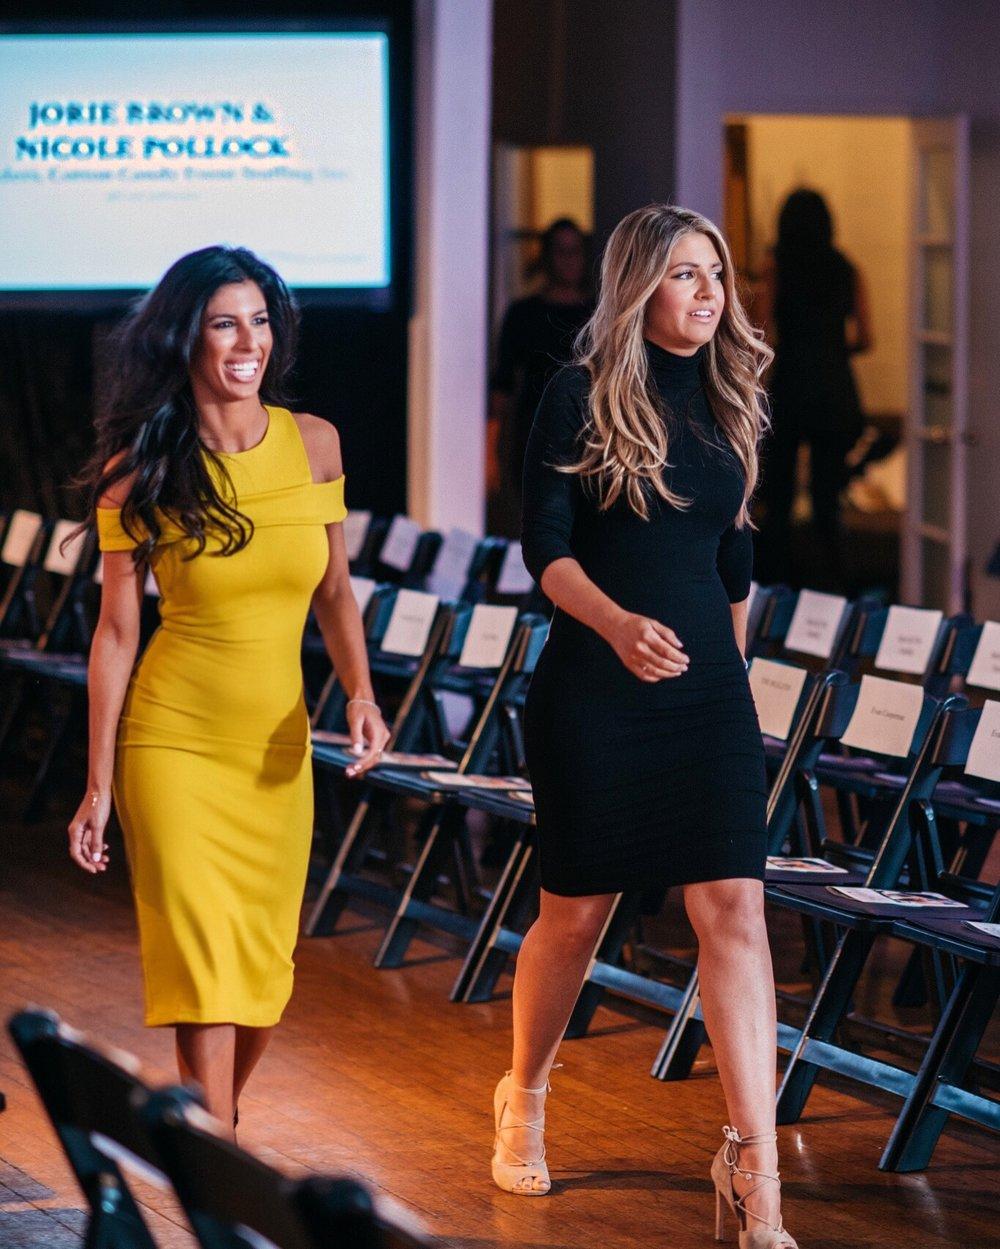 69903-nicole-pollock-and-jorie-brown-in-city-moguls-charity-fashion-show.jpg